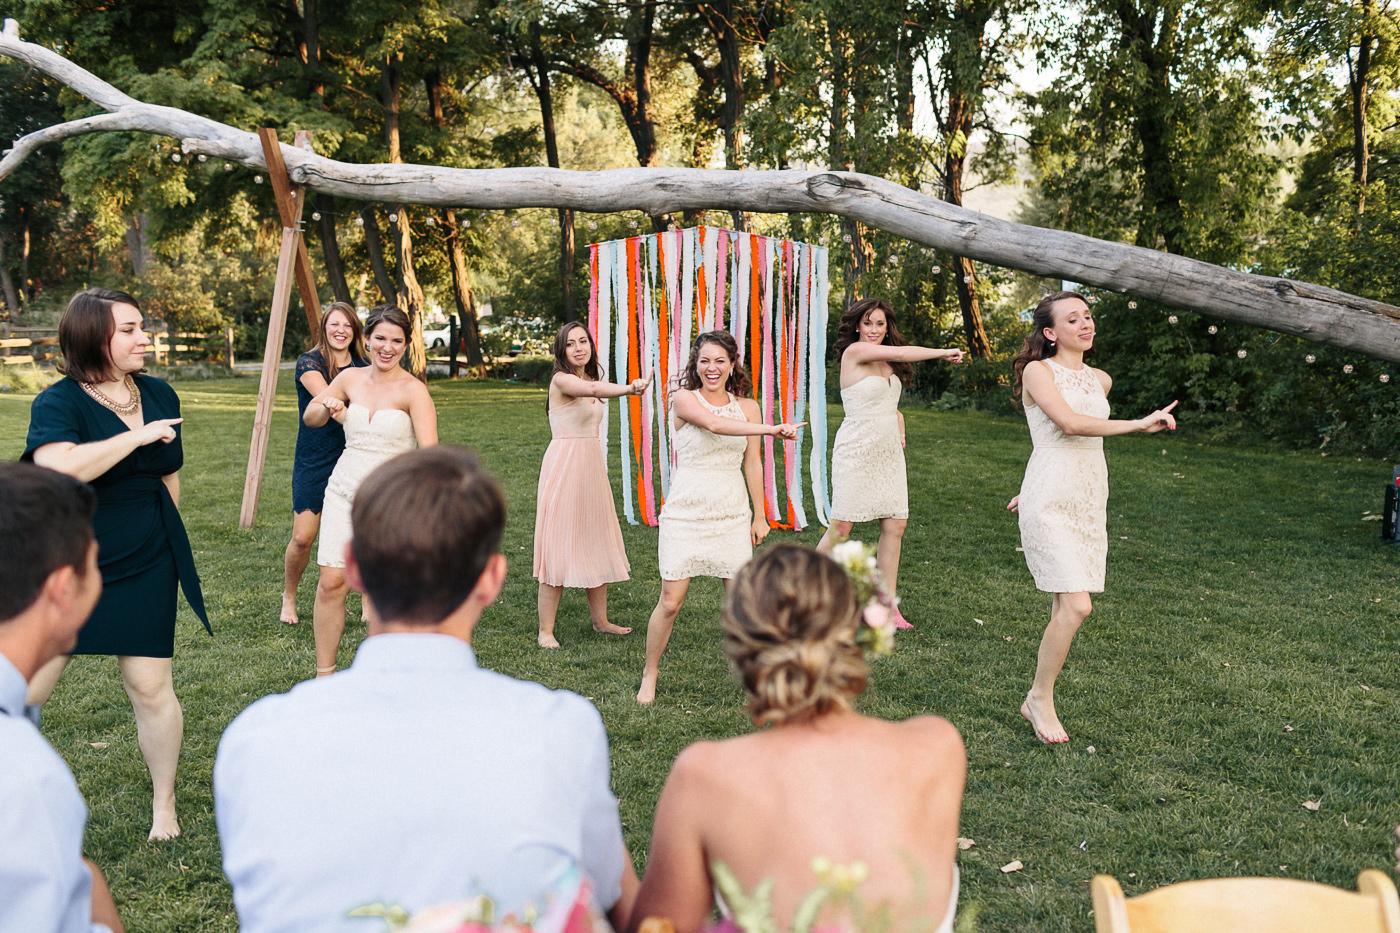 108-lyons-farmette-wedding-photographer-lucy-austin-flash-mob-dance.jpg